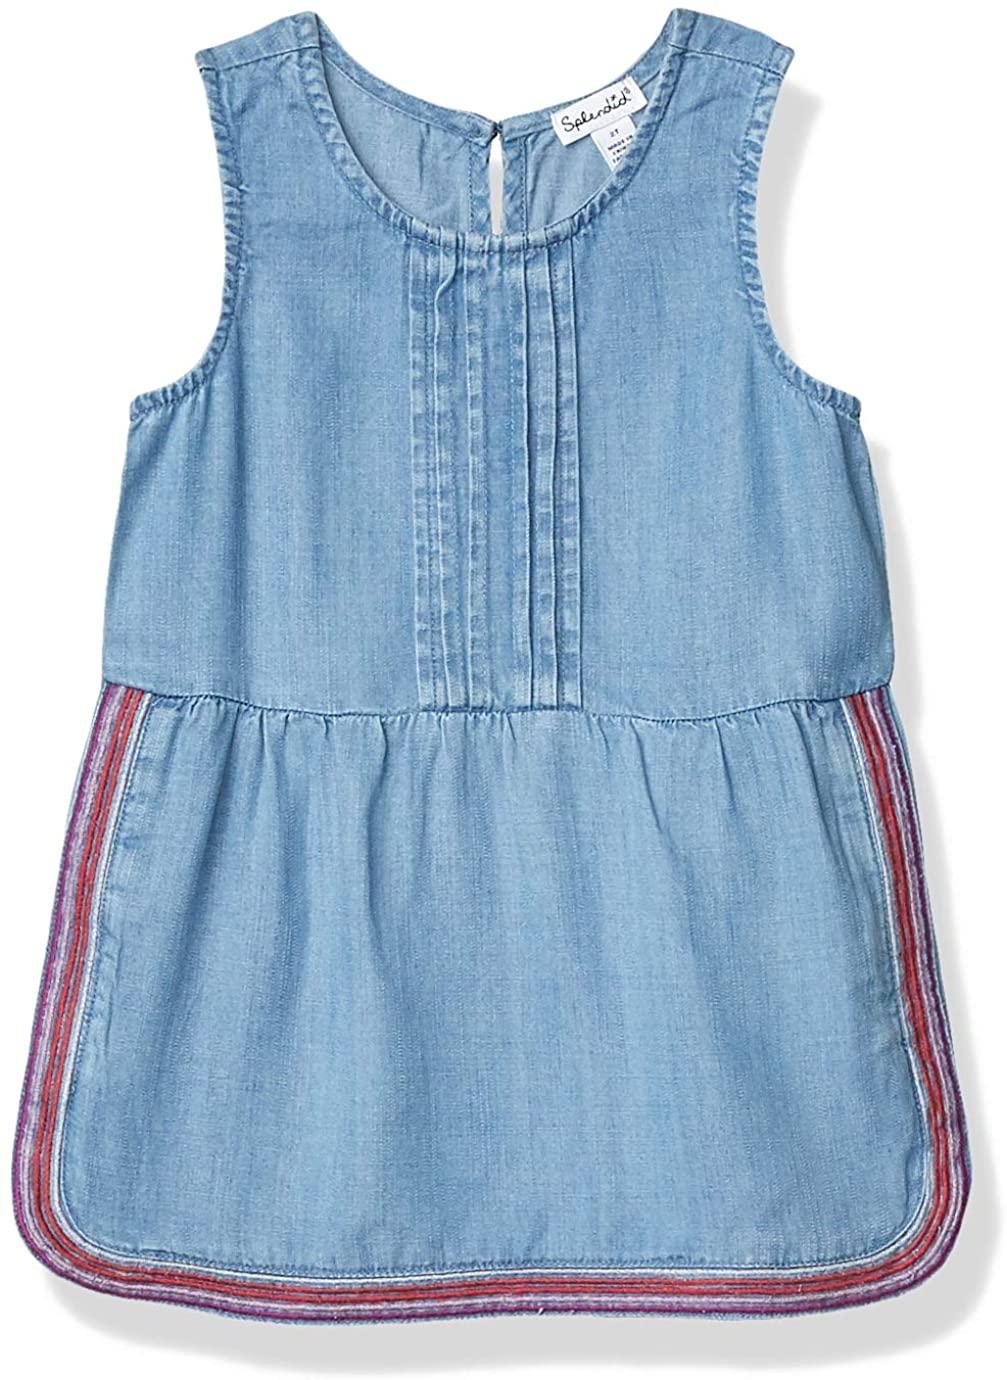 Splendid Girls' Kids' Tank Dress